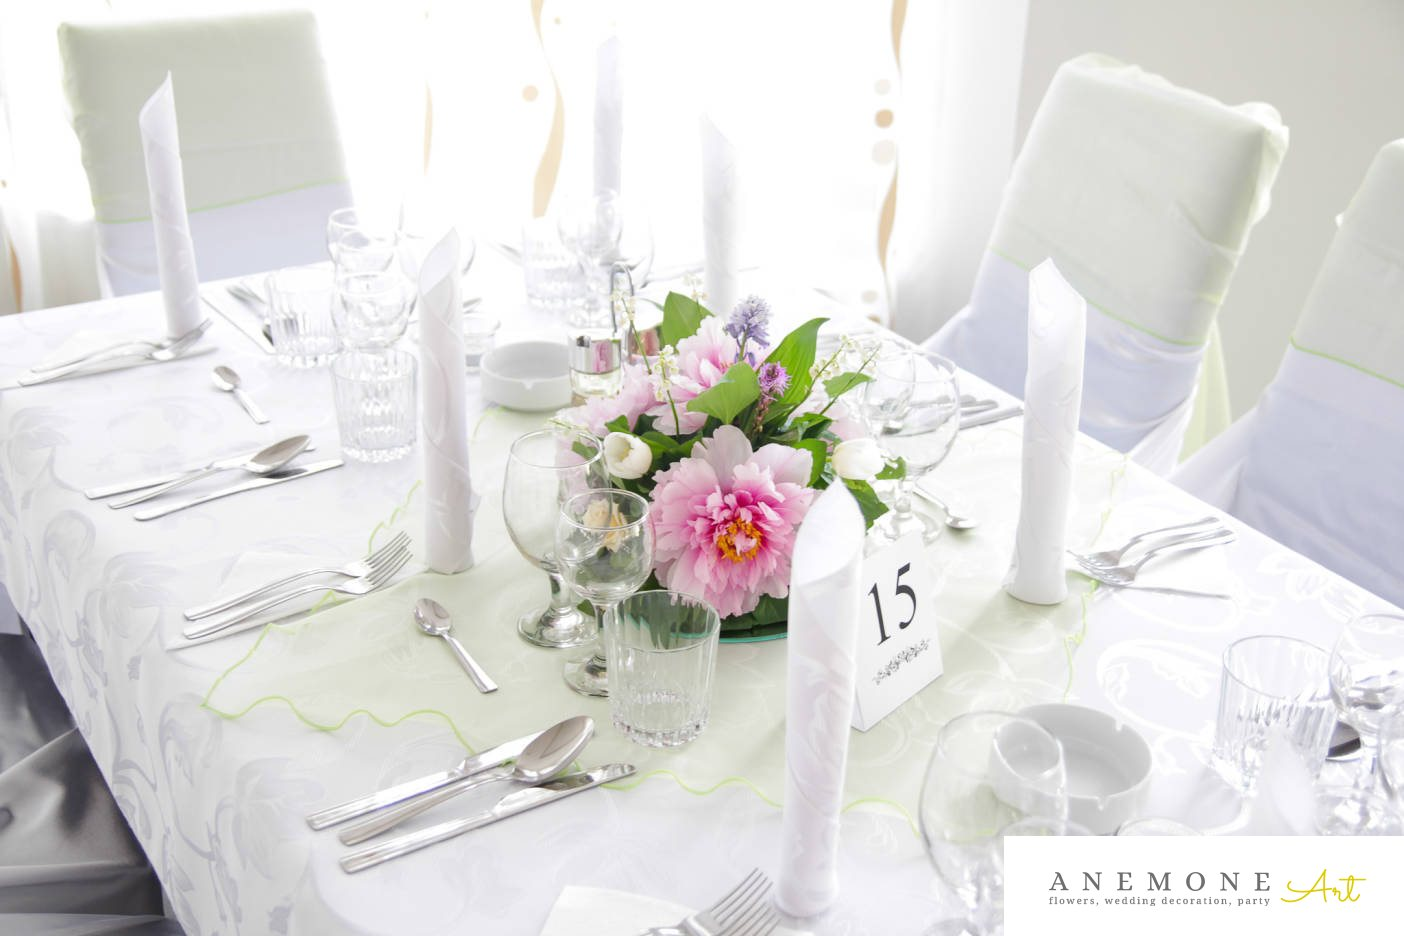 Poza, foto cu Flori de nunta alb, bujori, decor masa, lacramioare, lalele, lumanare, roz, trandafiri in Arad, Timisoara, Oradea (wedding flowers, bouquets) nunta Arad, Timisoara, Oradea